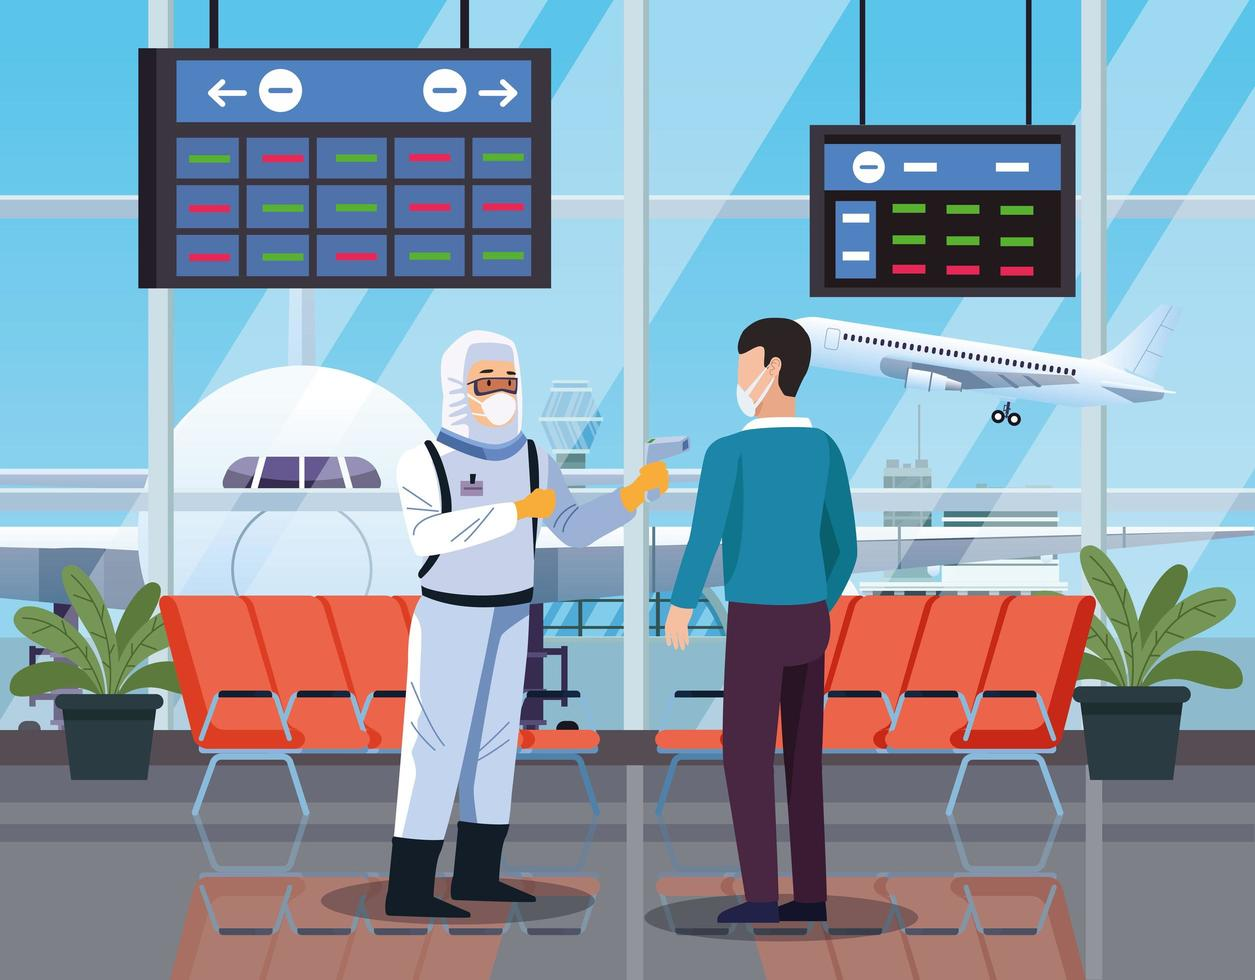 trabalhador de biossegurança verificando temperatura no aeroporto para coronavírus vetor